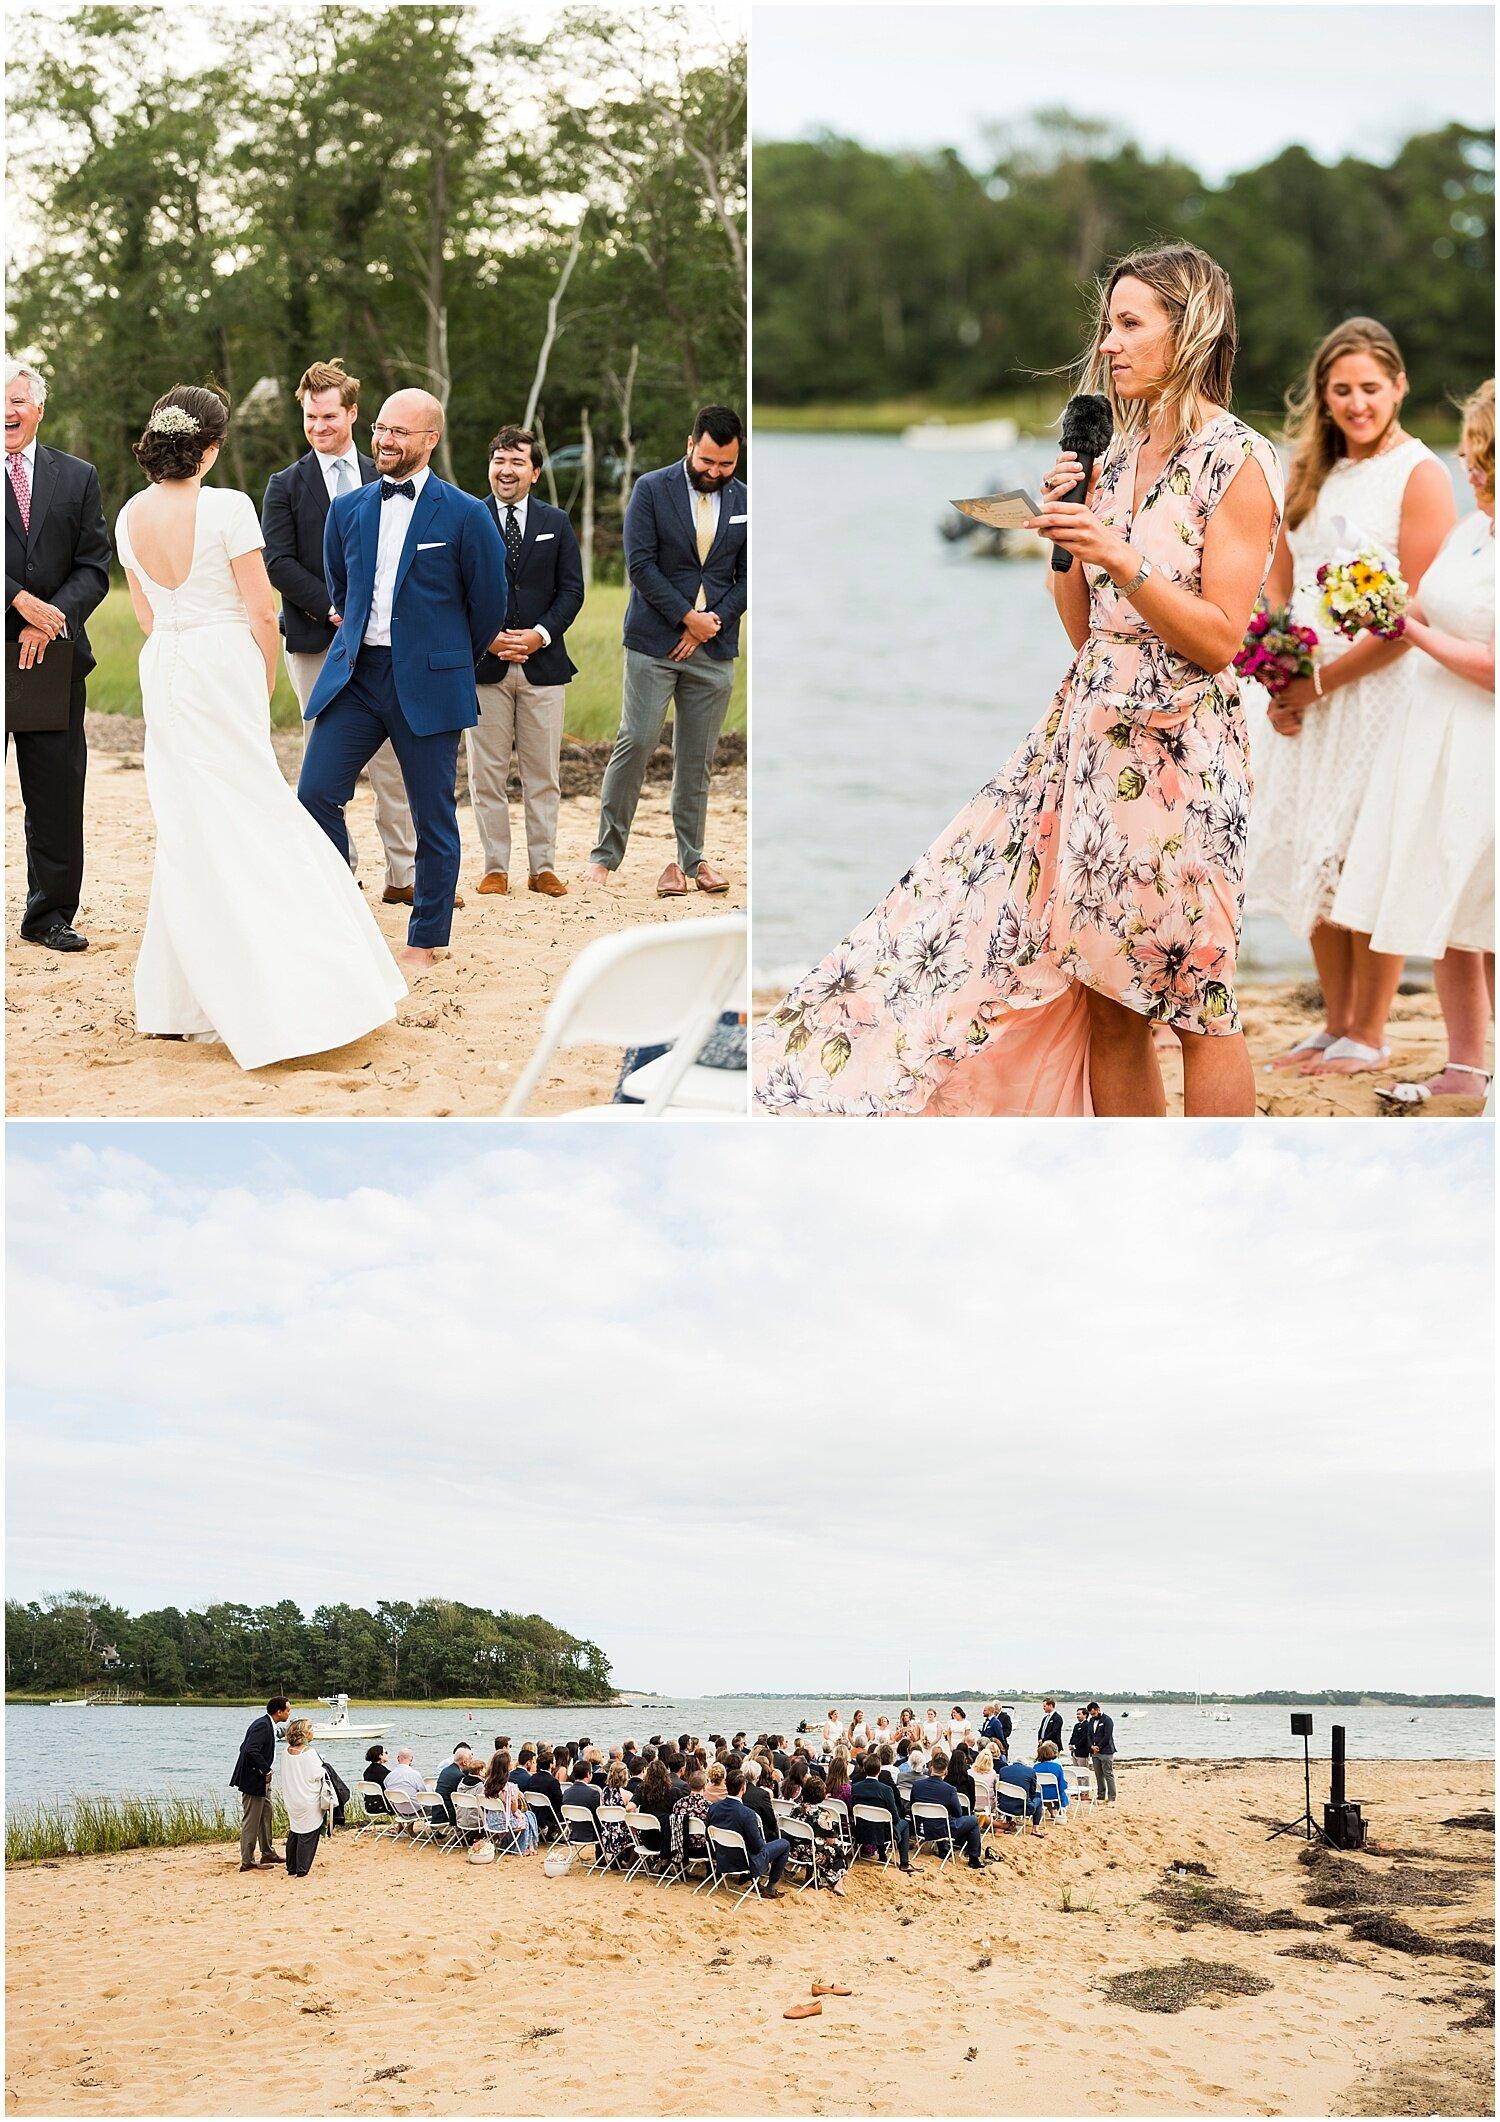 Cape-Cod-Wedding-Photographer-Apollo-Fields-196.jpg